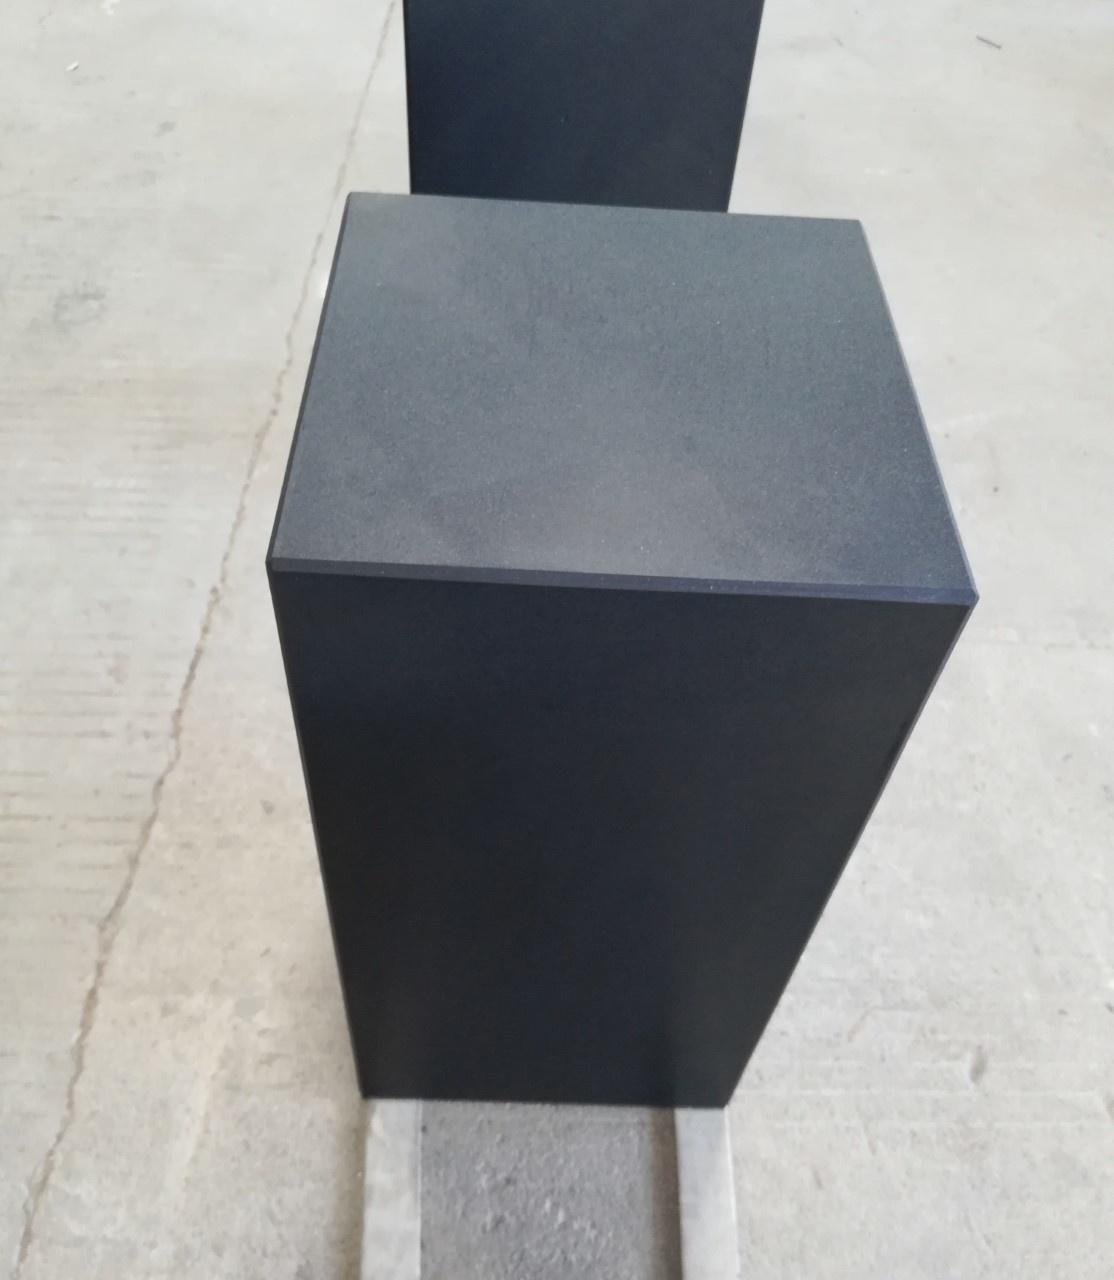 Eliassen Base black granite matt 30x30x90cm